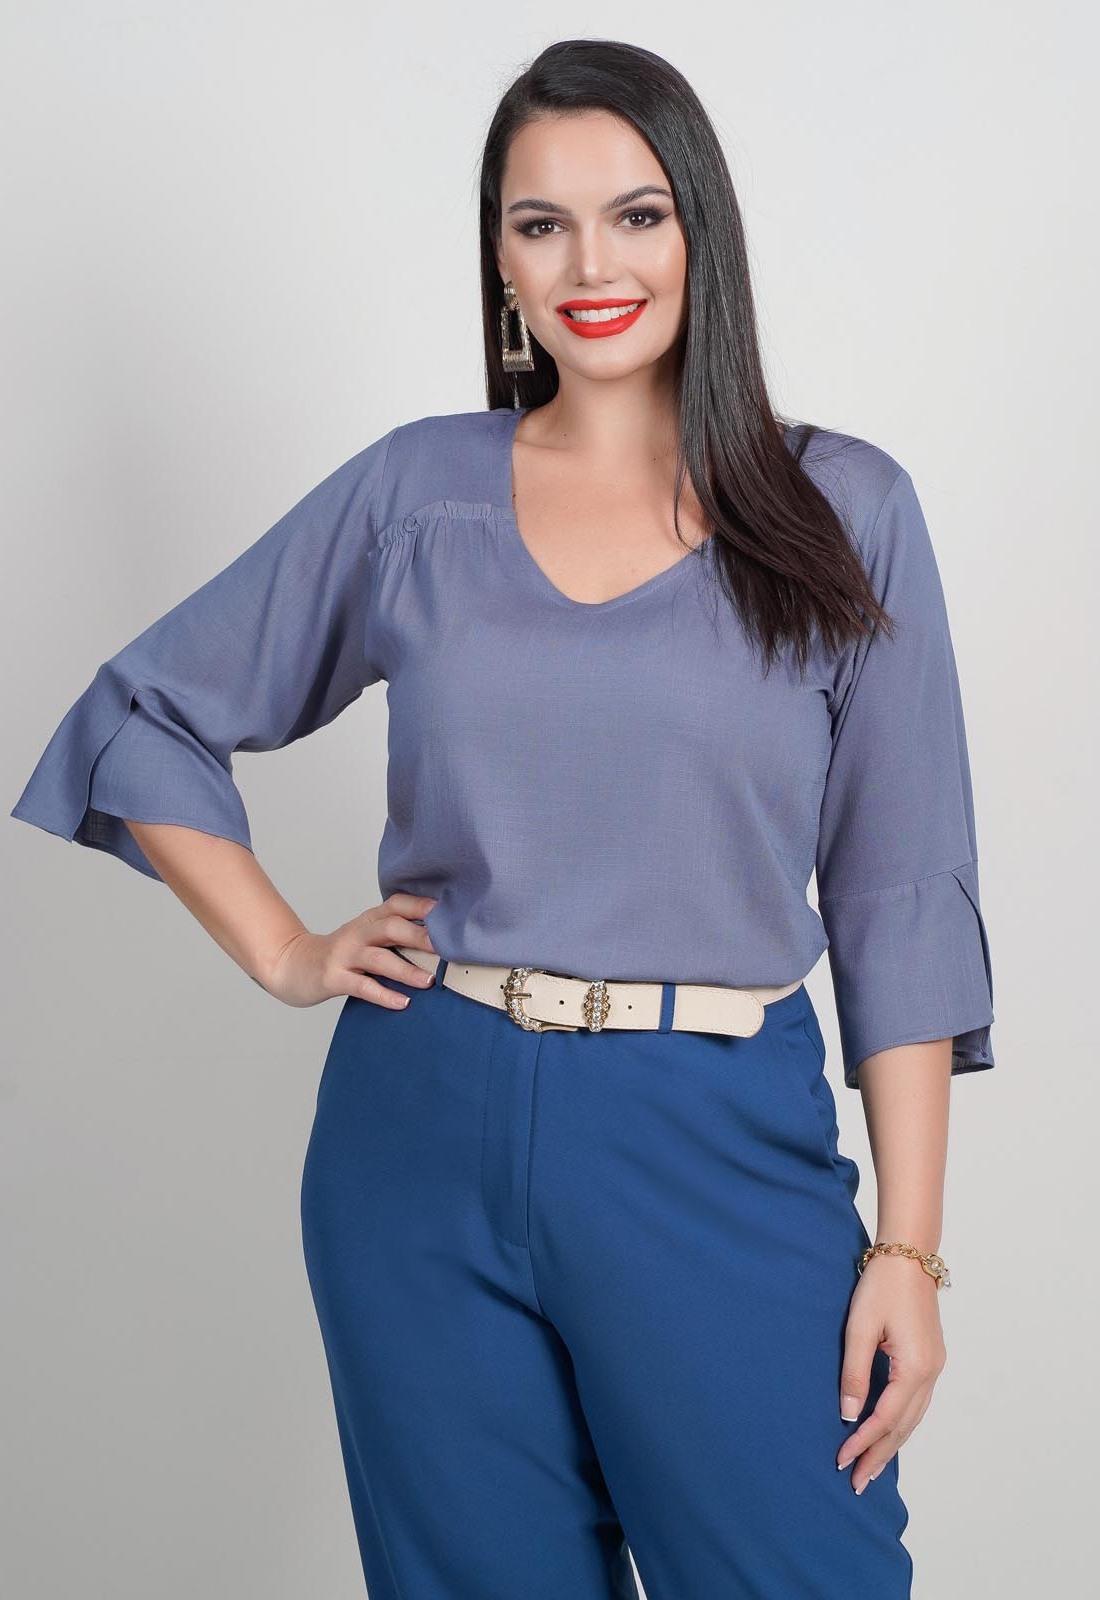 Blusa plus size azul lisa com manga Ref. U64921